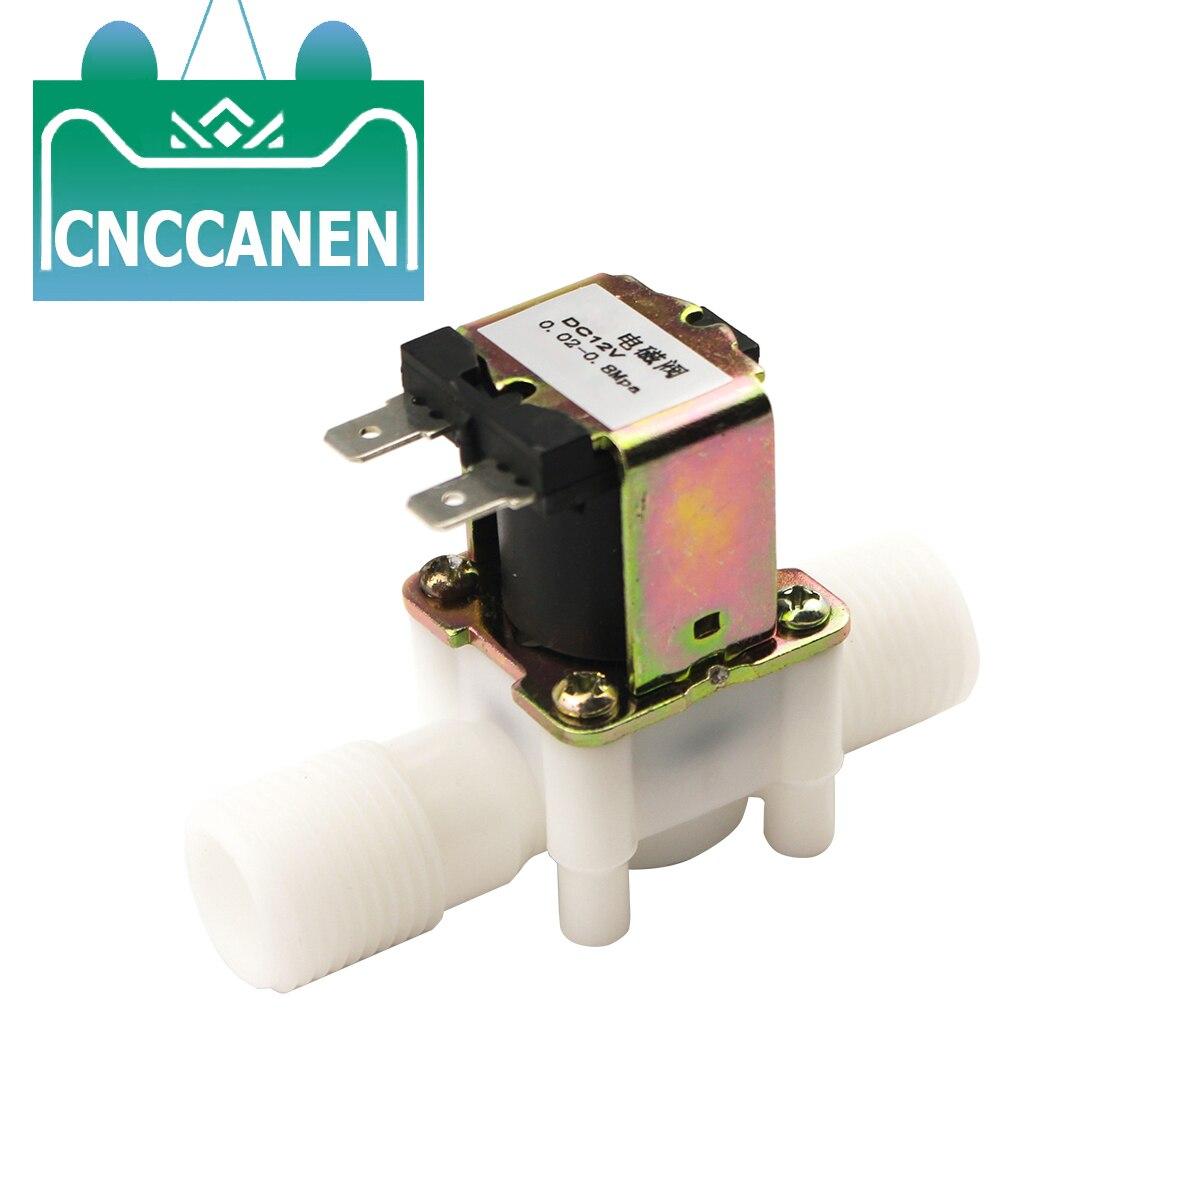 "1/2"" Plastic Solenoid Valve 12V 24V 220V Magnetic Water Control Valve Pneumatic Pressure Controller Switch Normally Closed N/C"